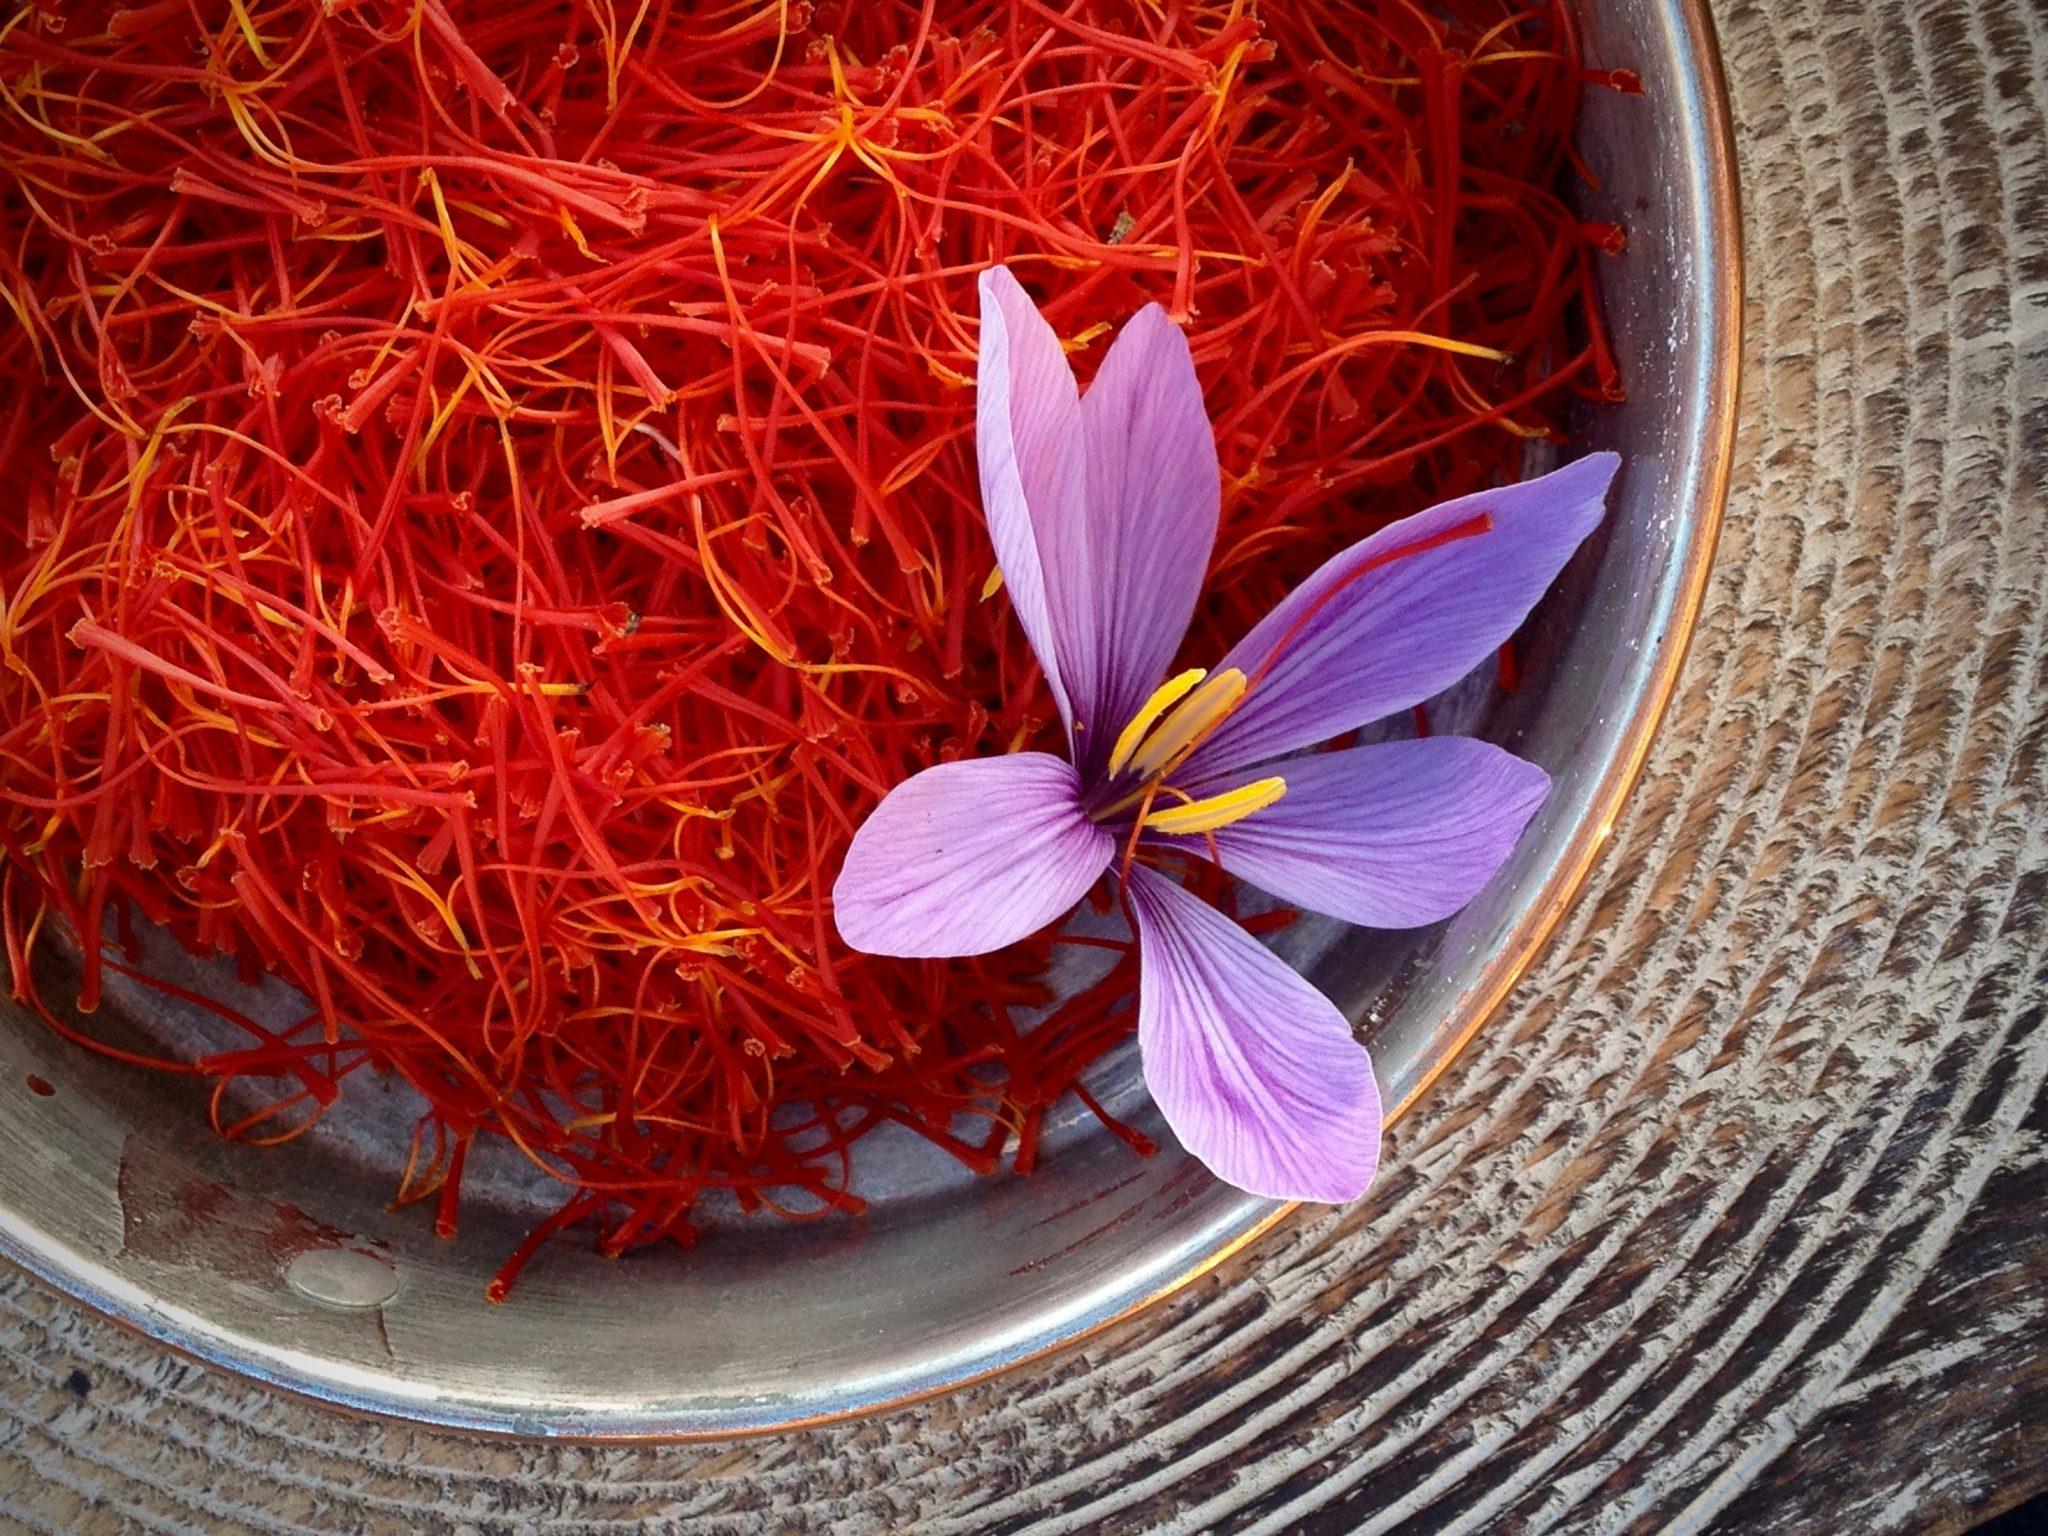 Gourmet-Cargo-Spanish-Saffron